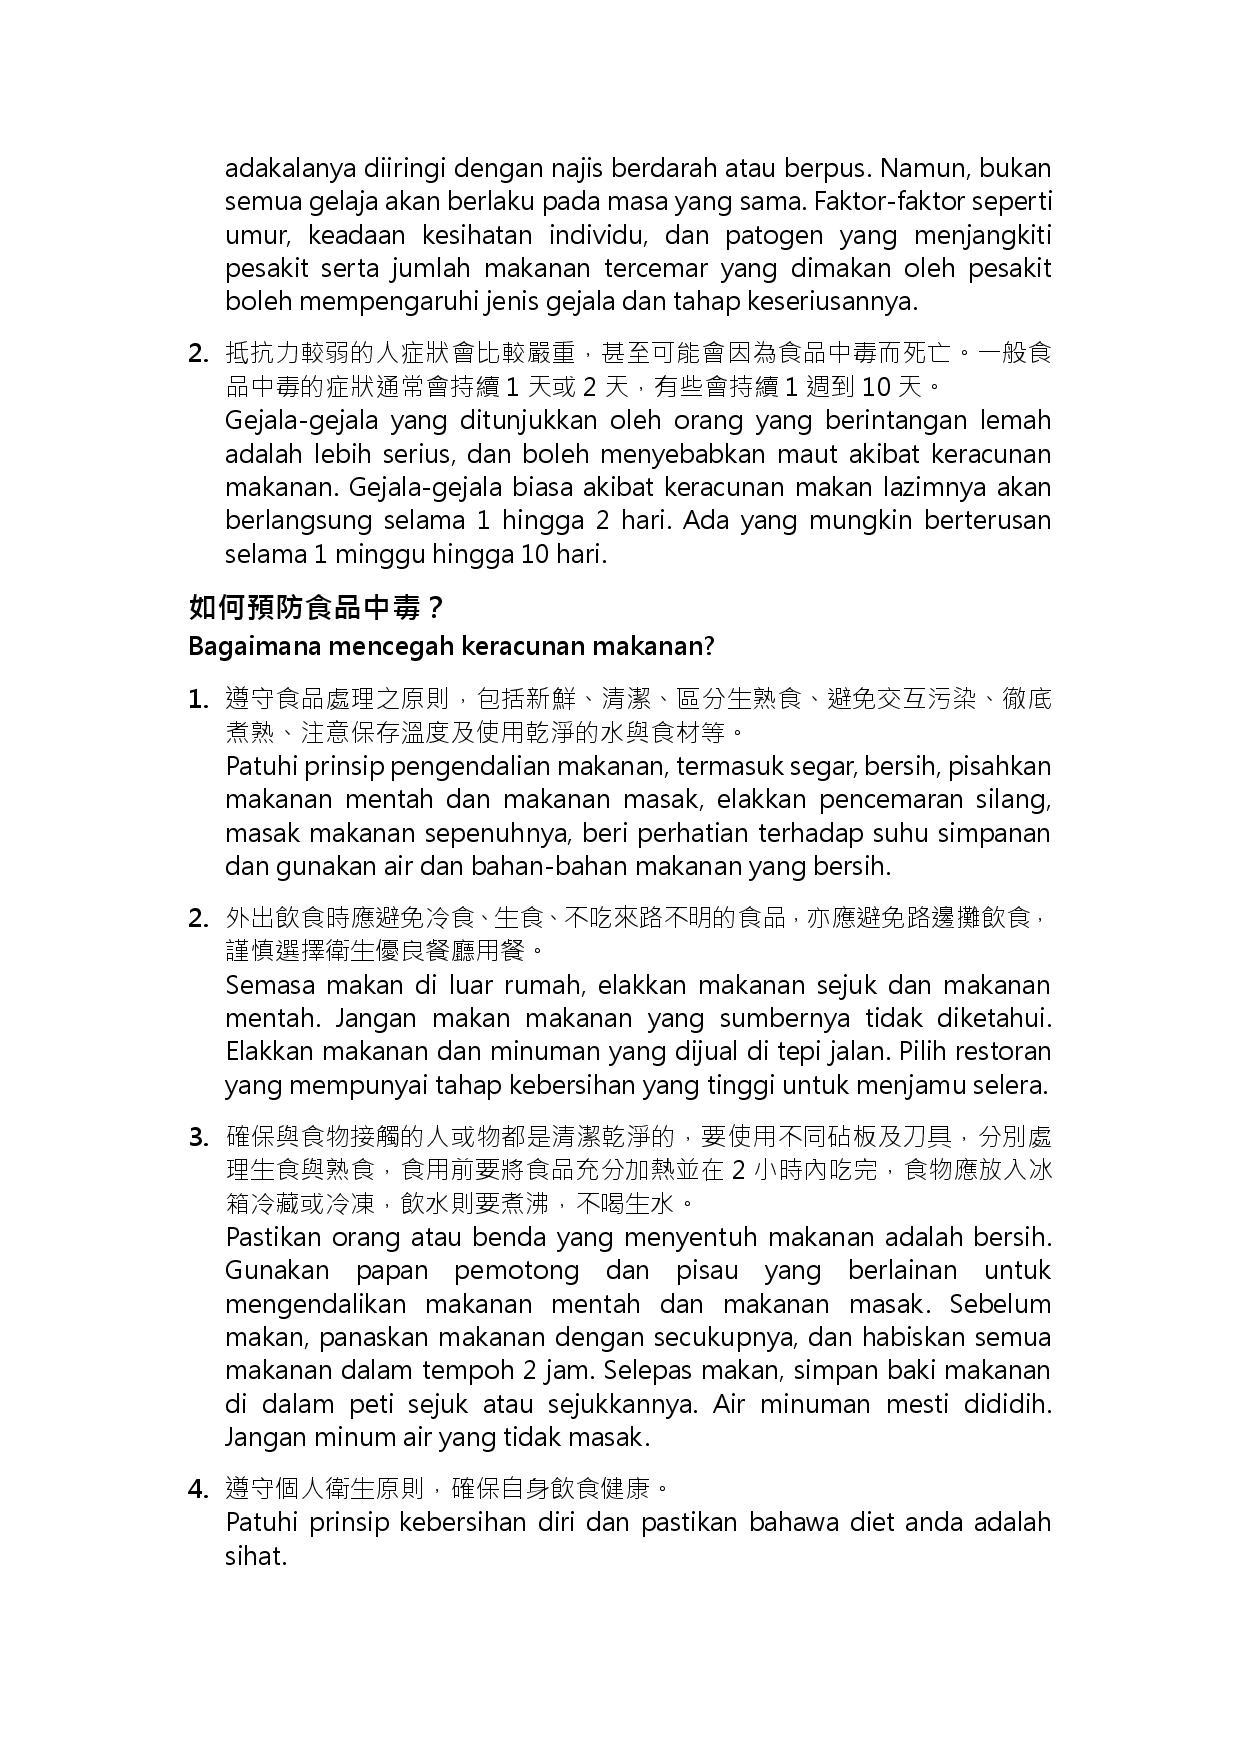 詳如附件【klik saya】Untuk mencegah keracunan makanan(Halaman 2)預防食品中毒(馬來文)